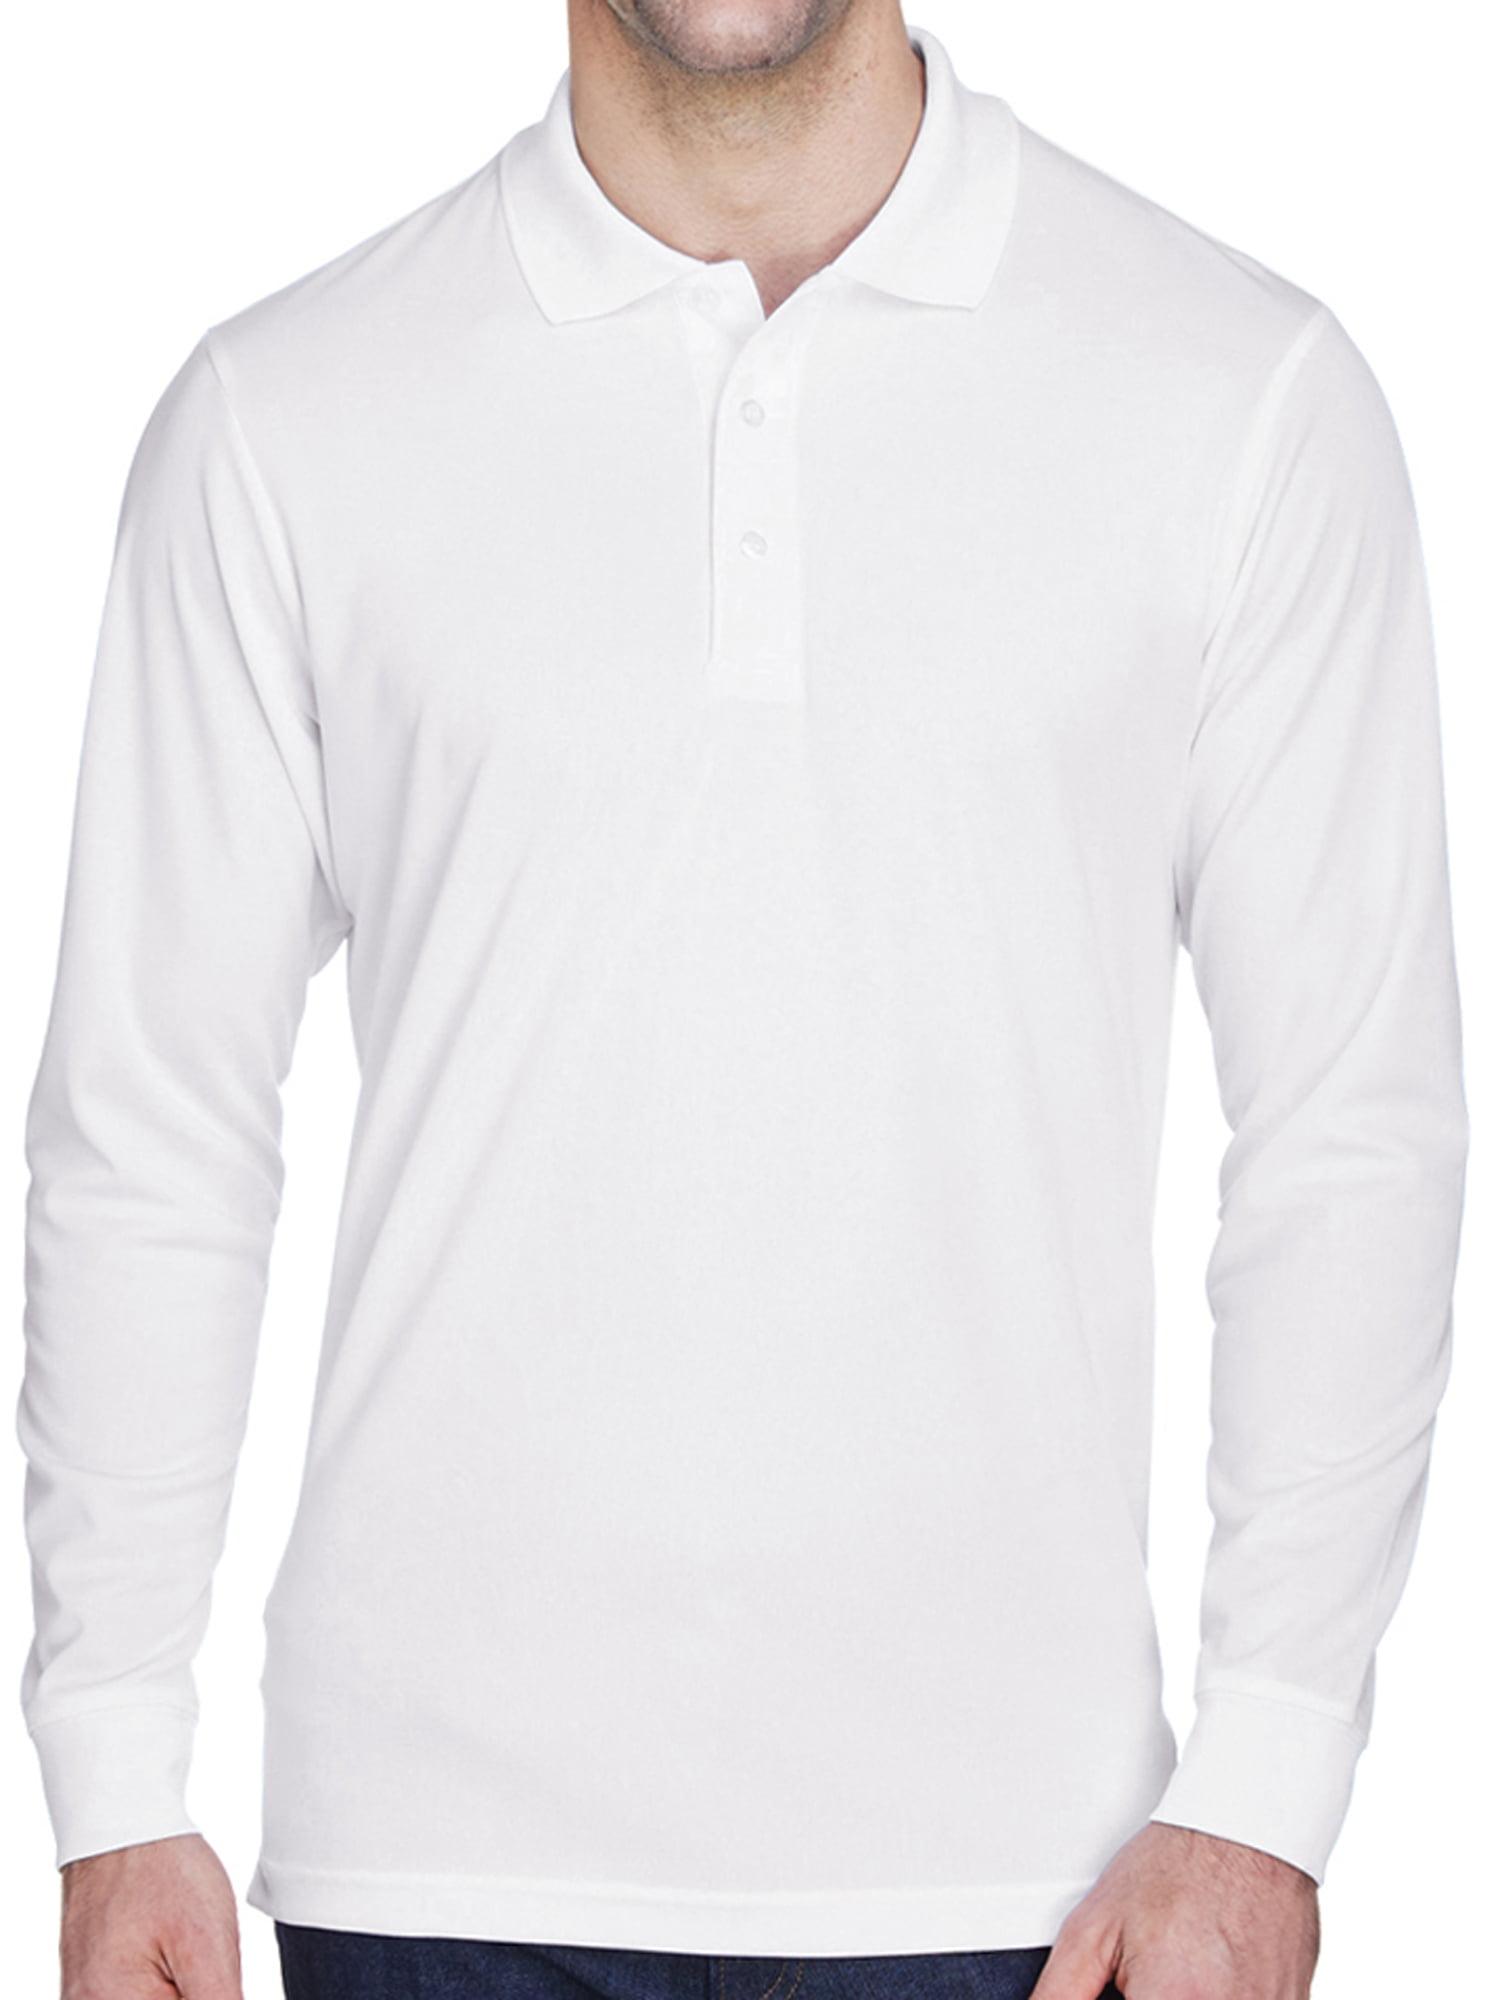 Mens Moisture-Wicking Long Sleeve Polo Shirt - White, 4XL